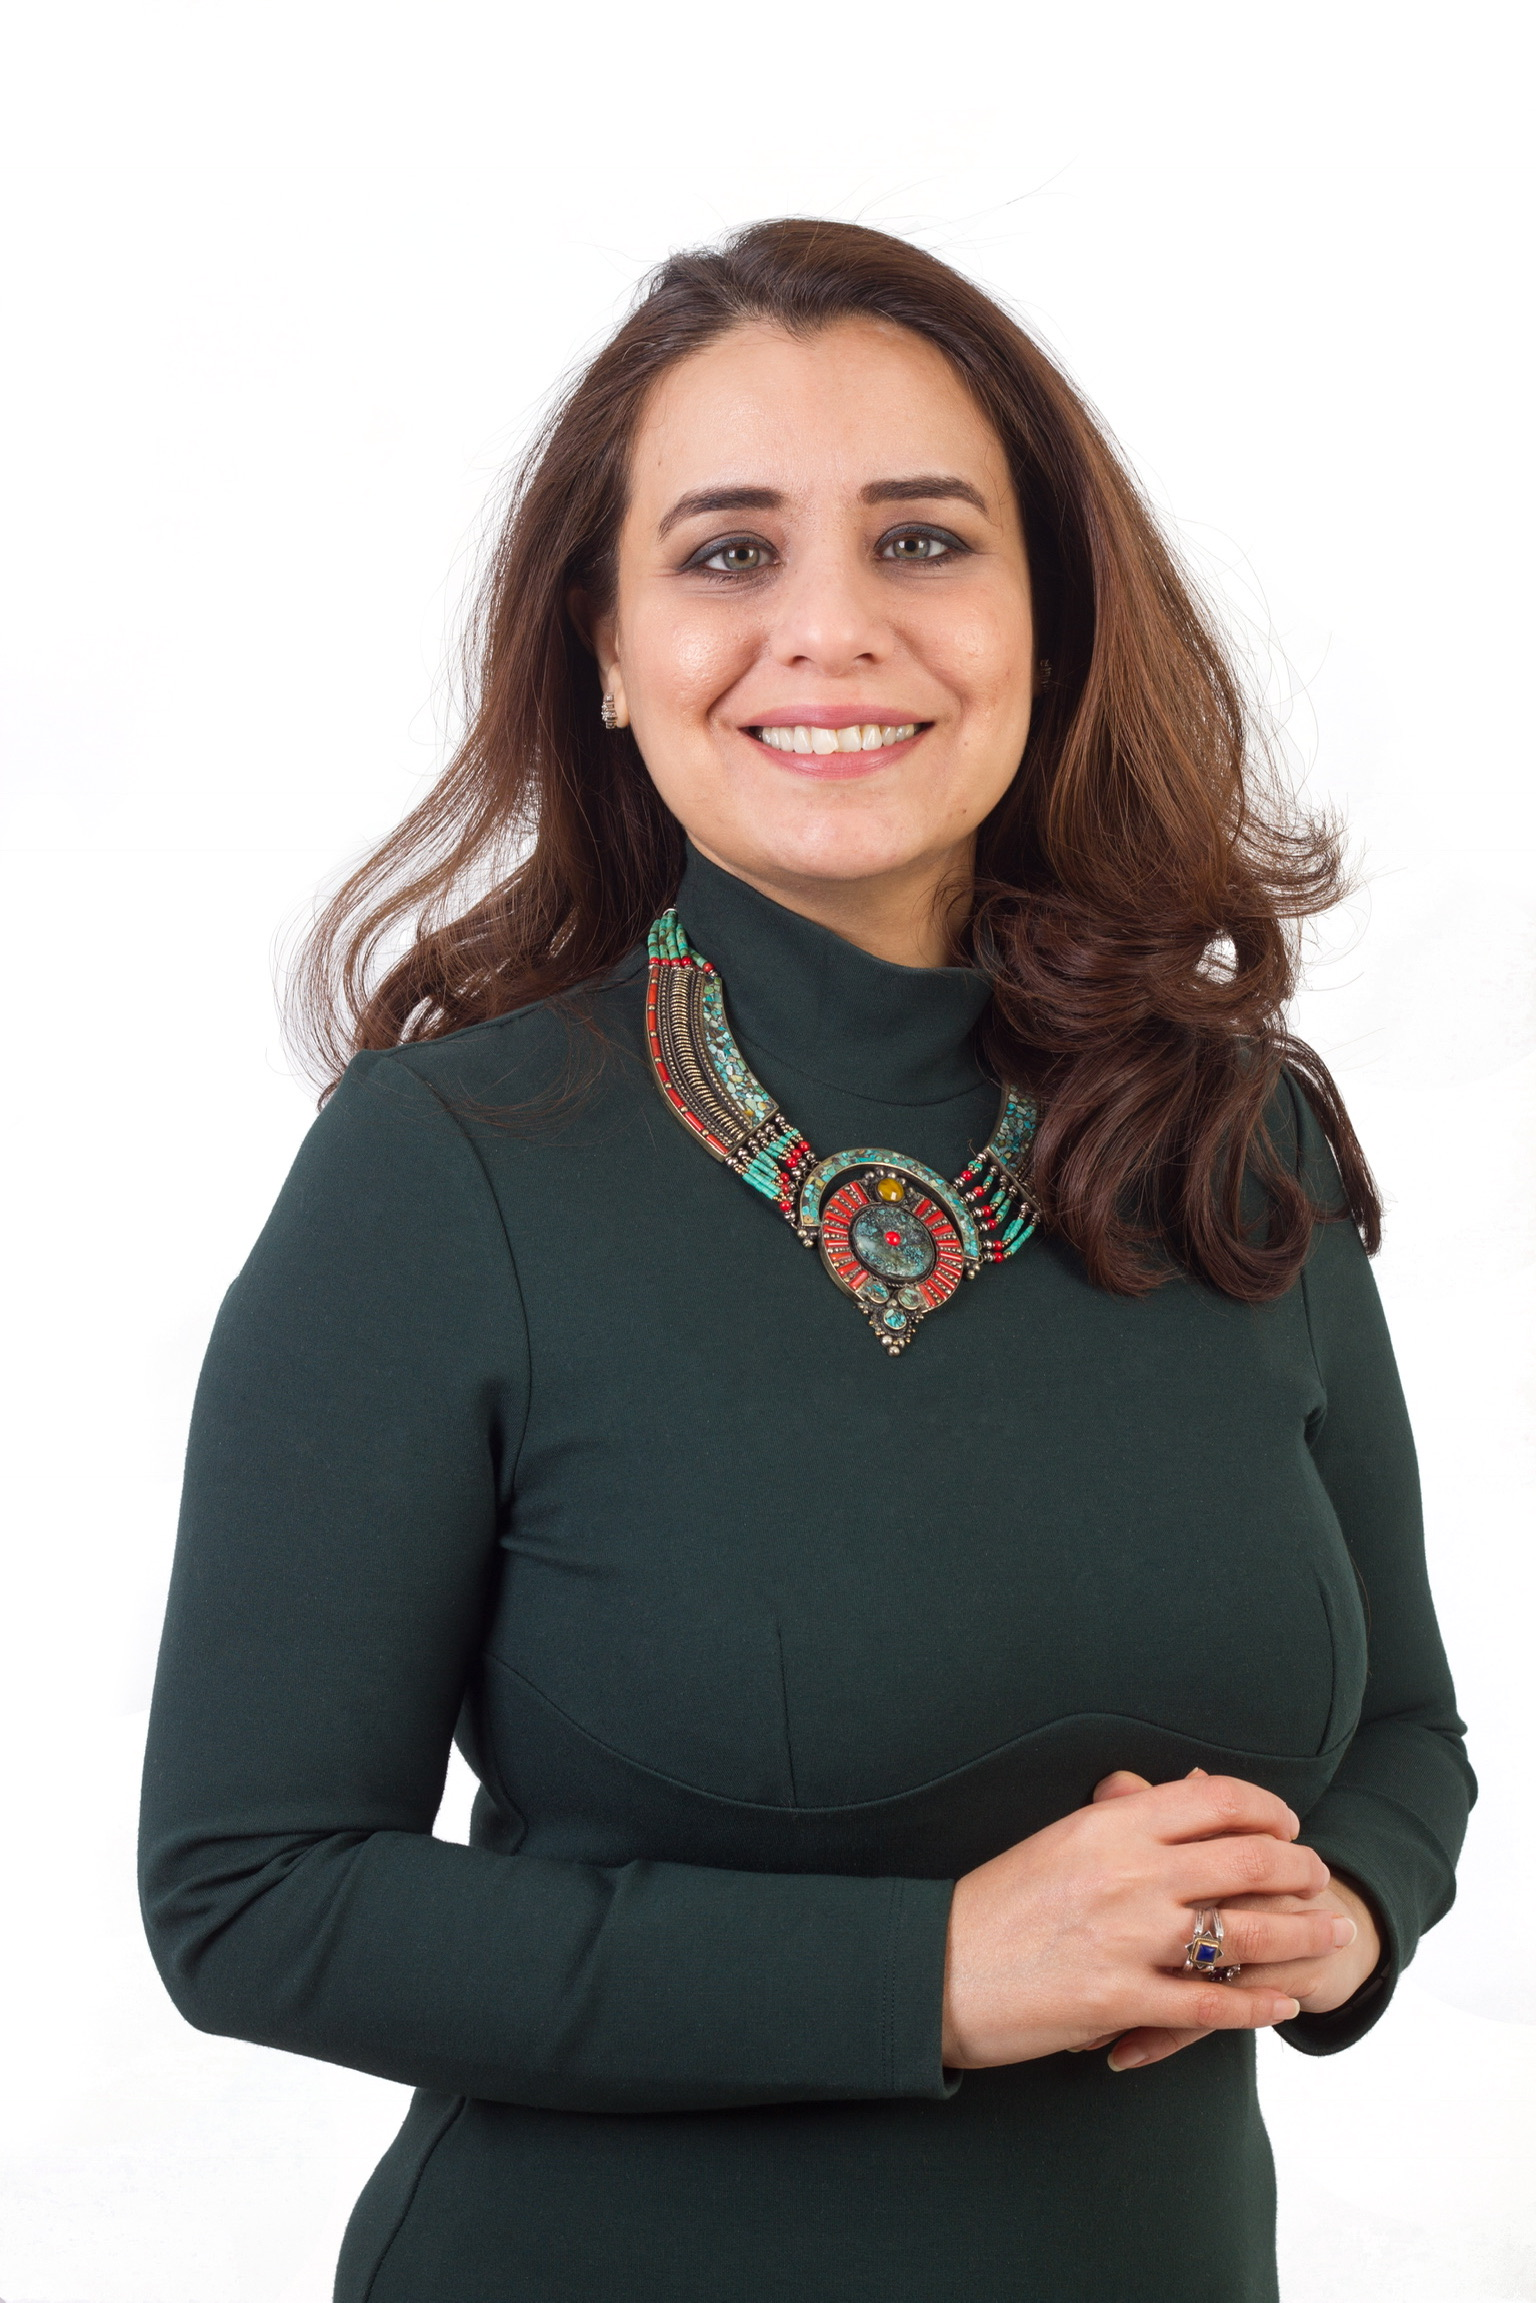 Fatima Syedain